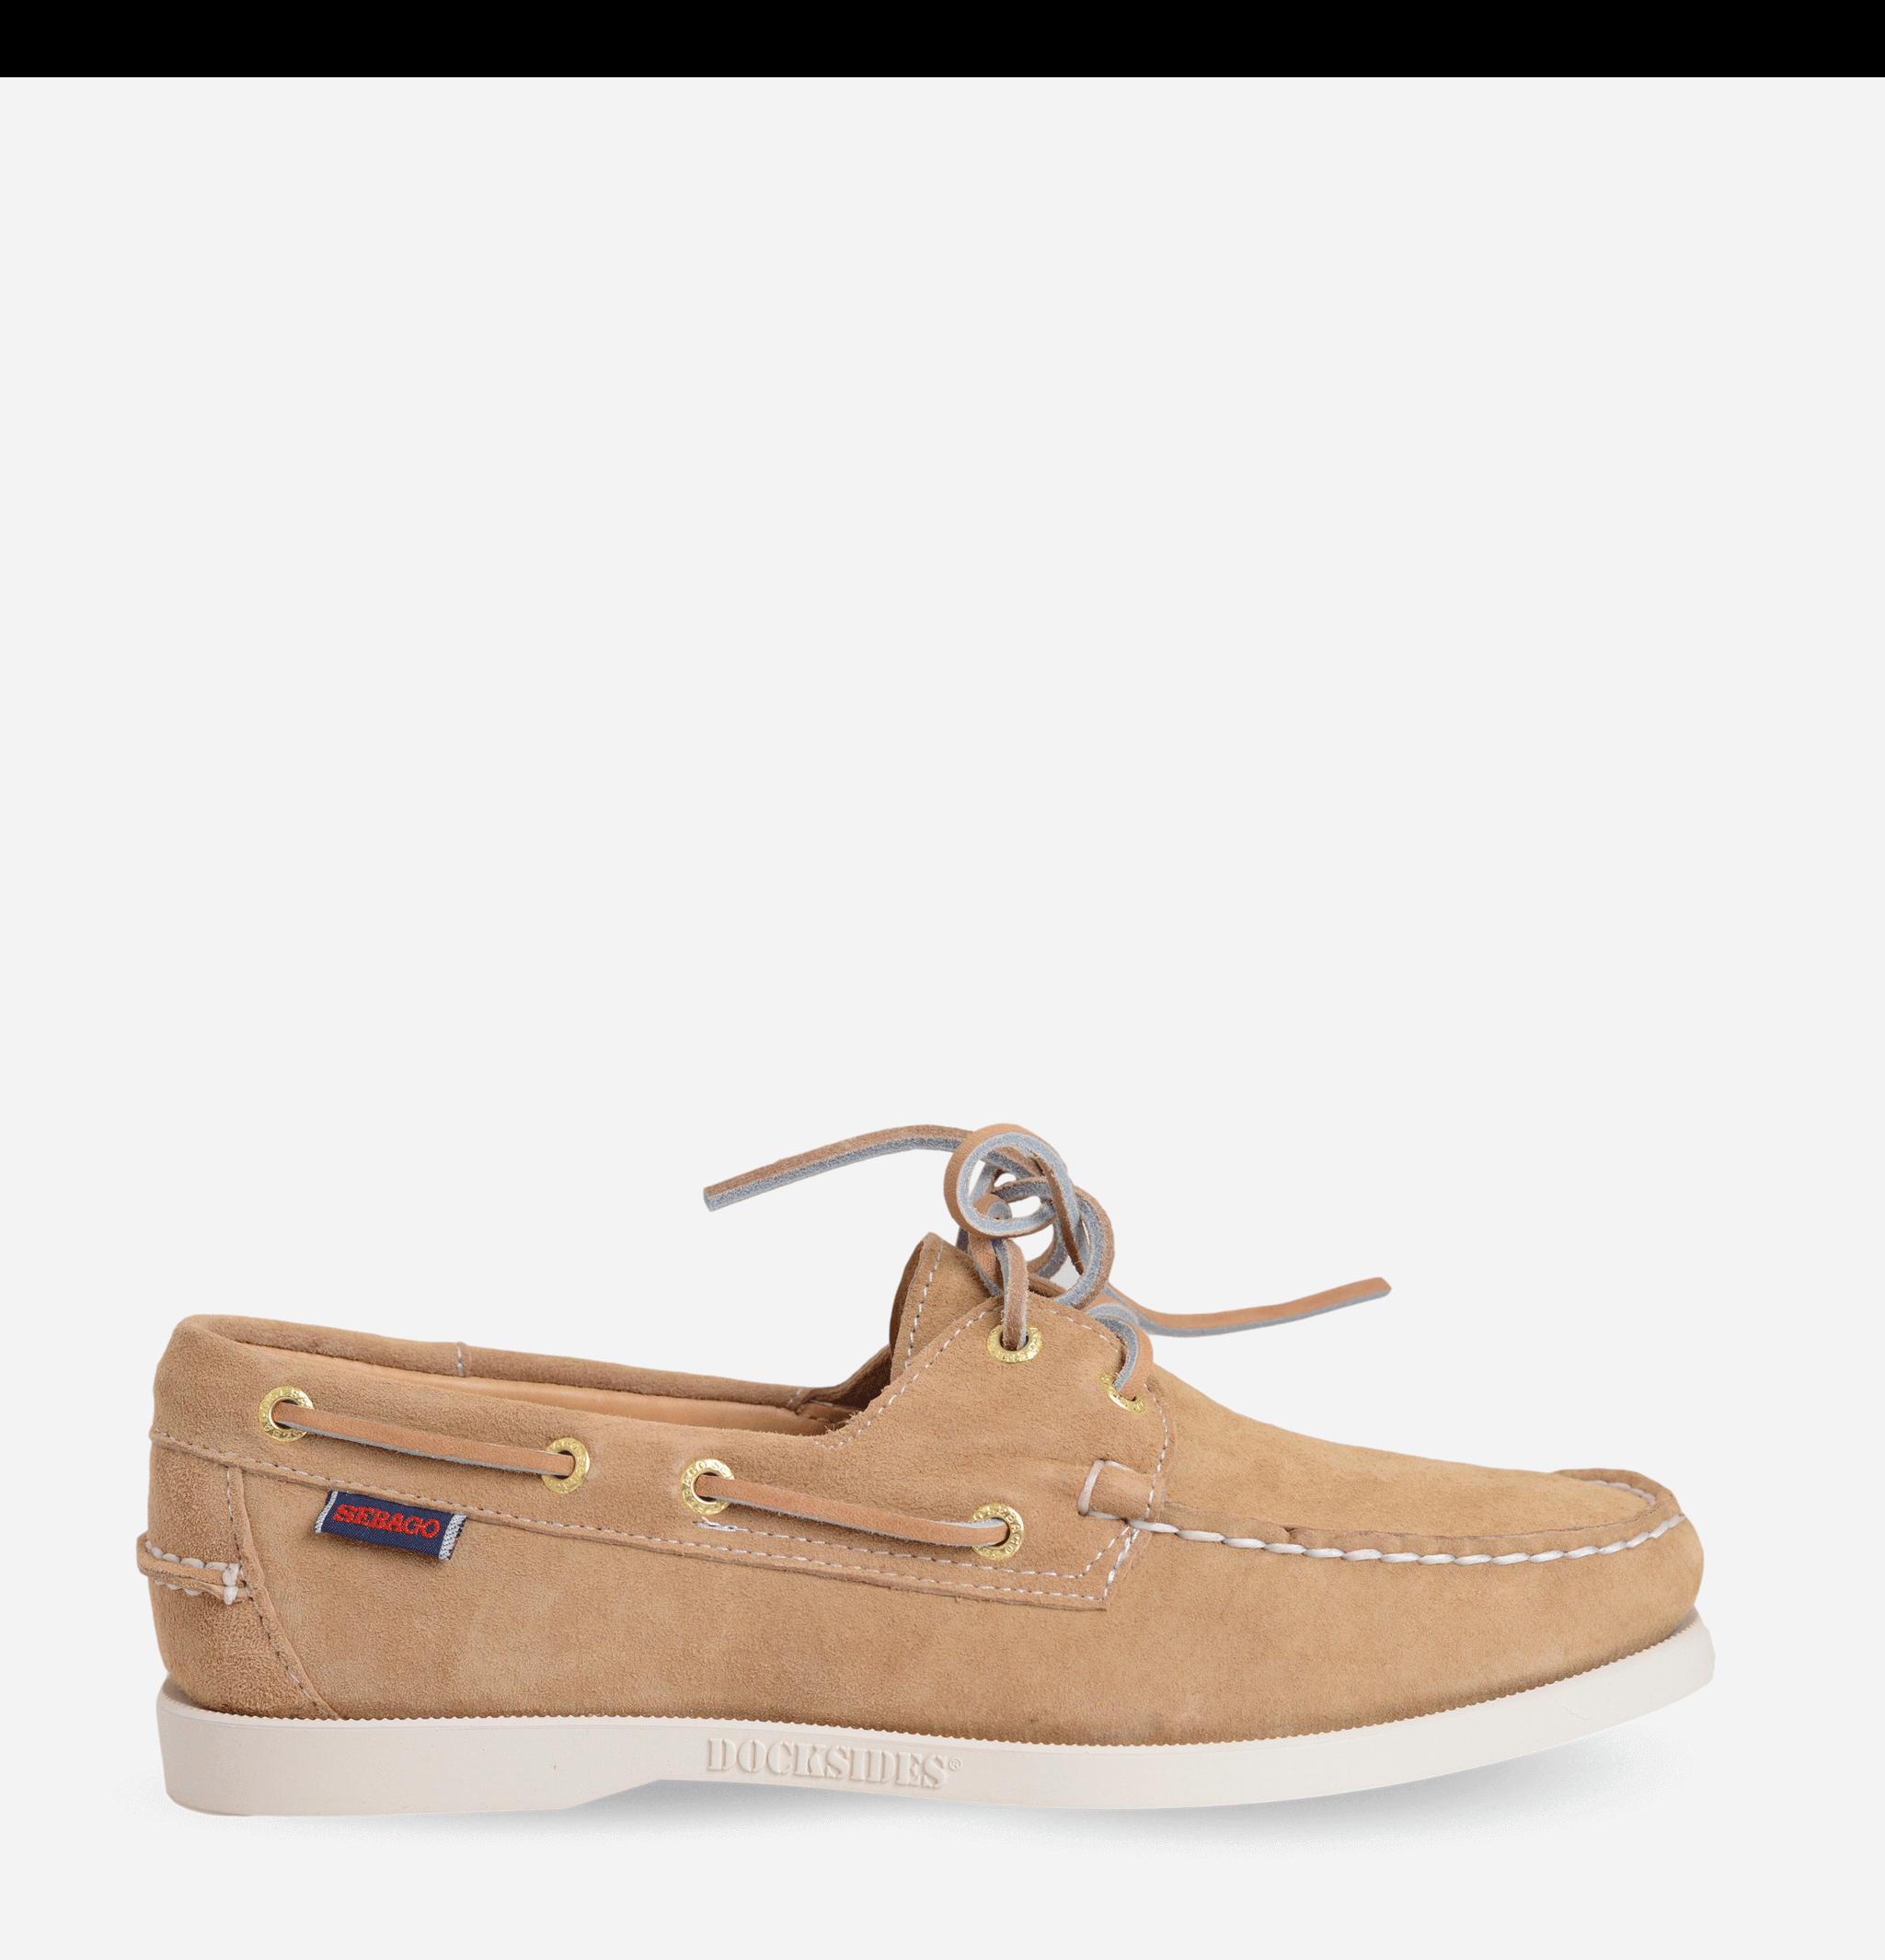 Docksides Shoes Sand Suede